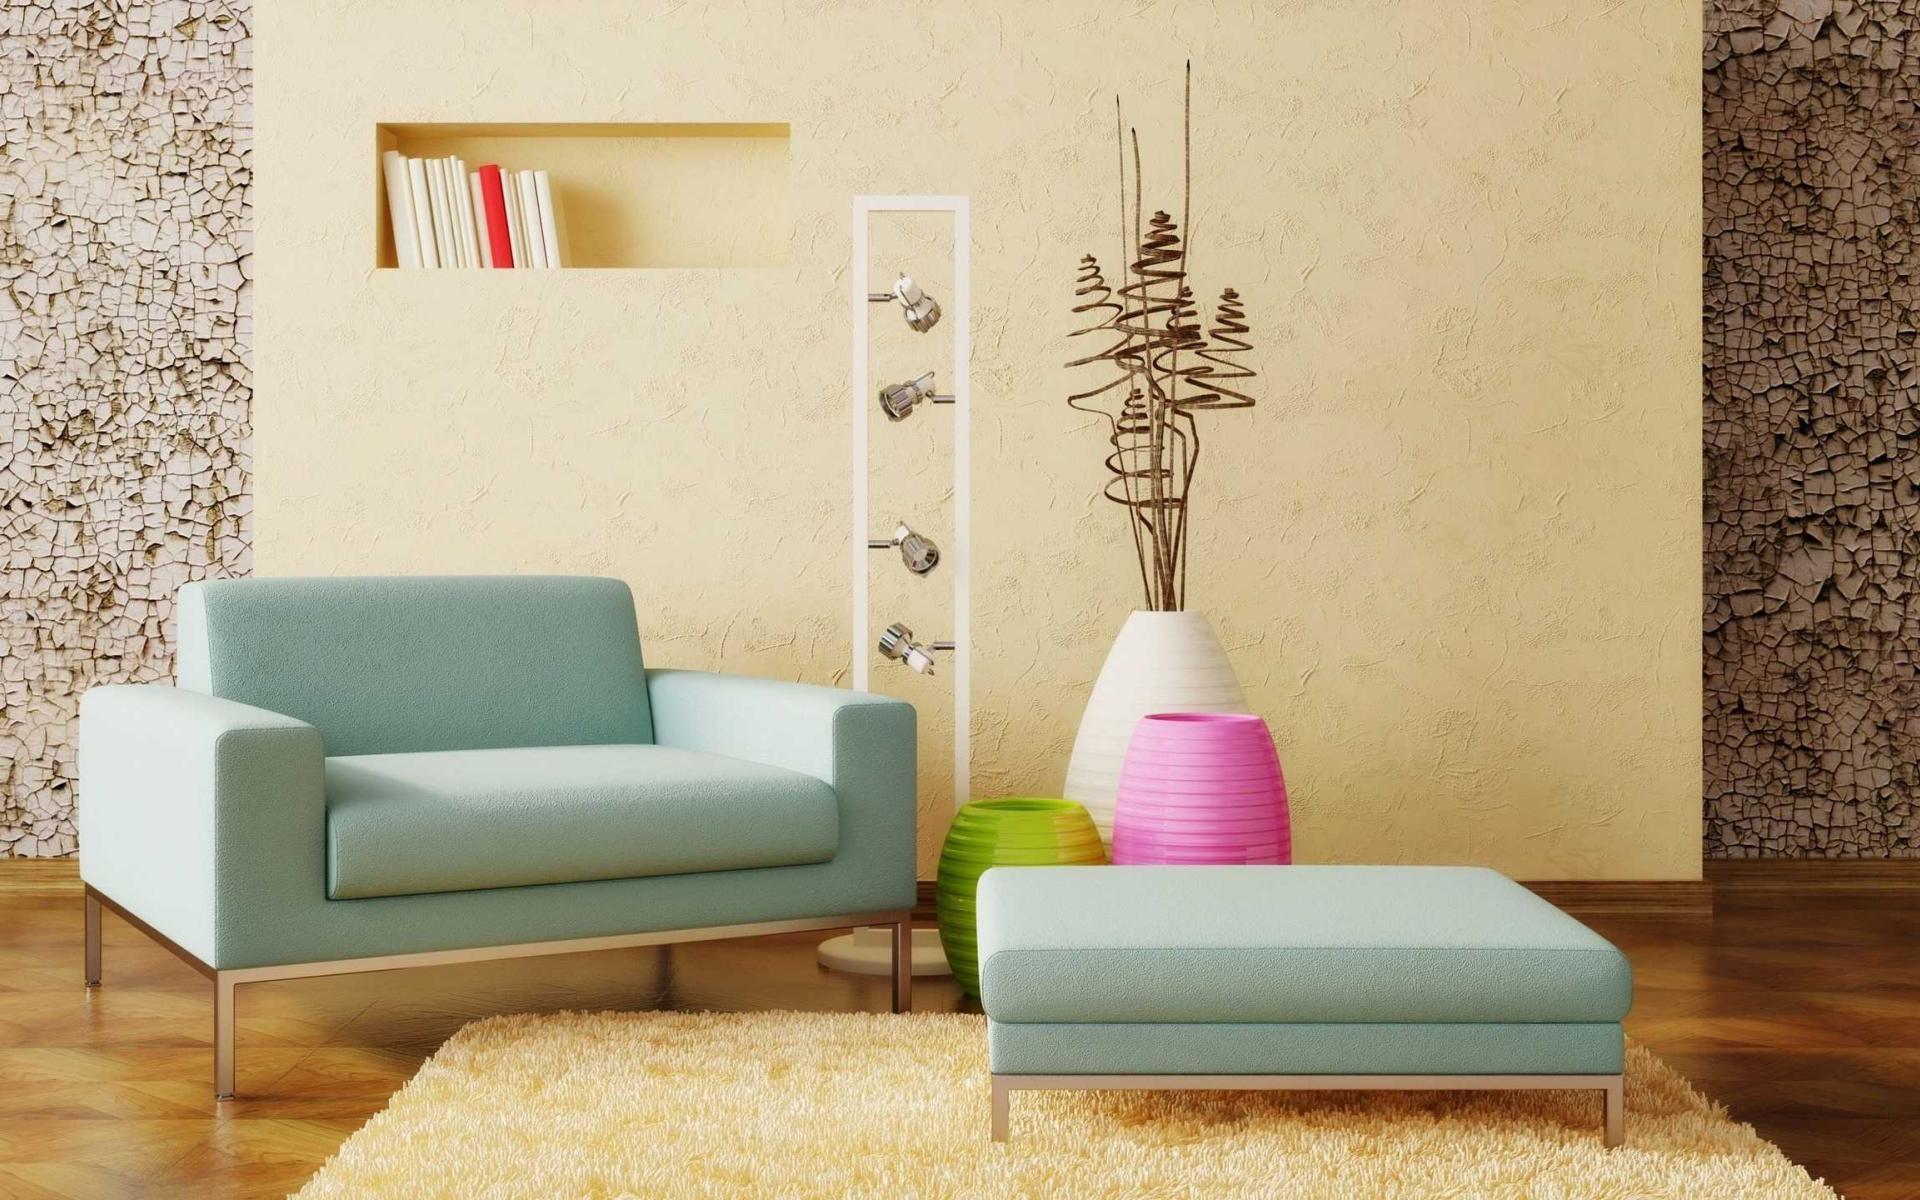 interior-wallpapers-28651-4281330.jpg